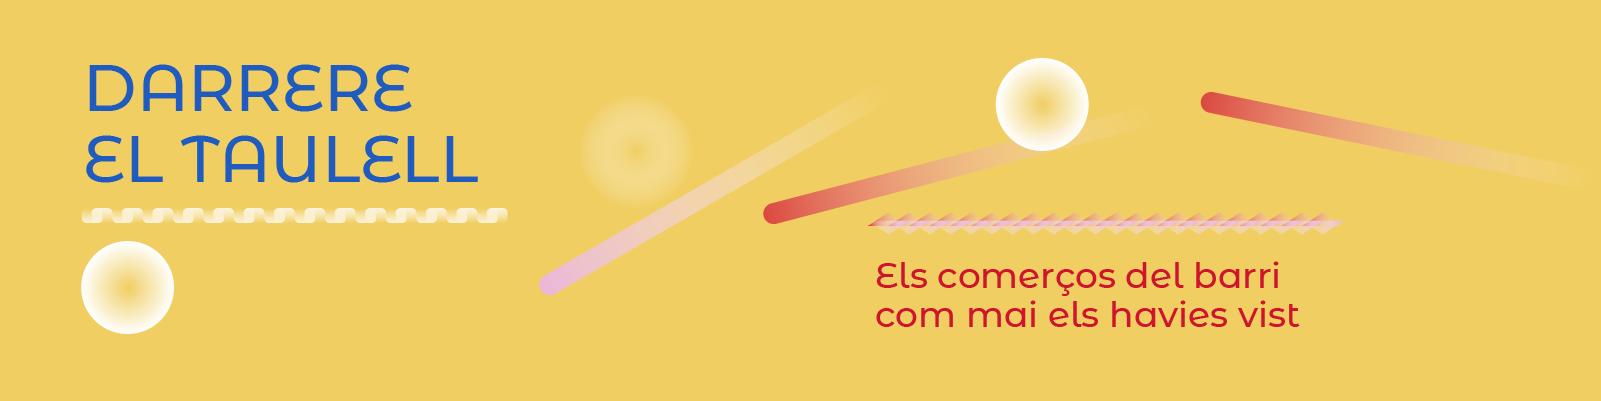 https://ajuntament.barcelona.cat/comerc/sites/default/files/revslider/image/banner_com-06.png